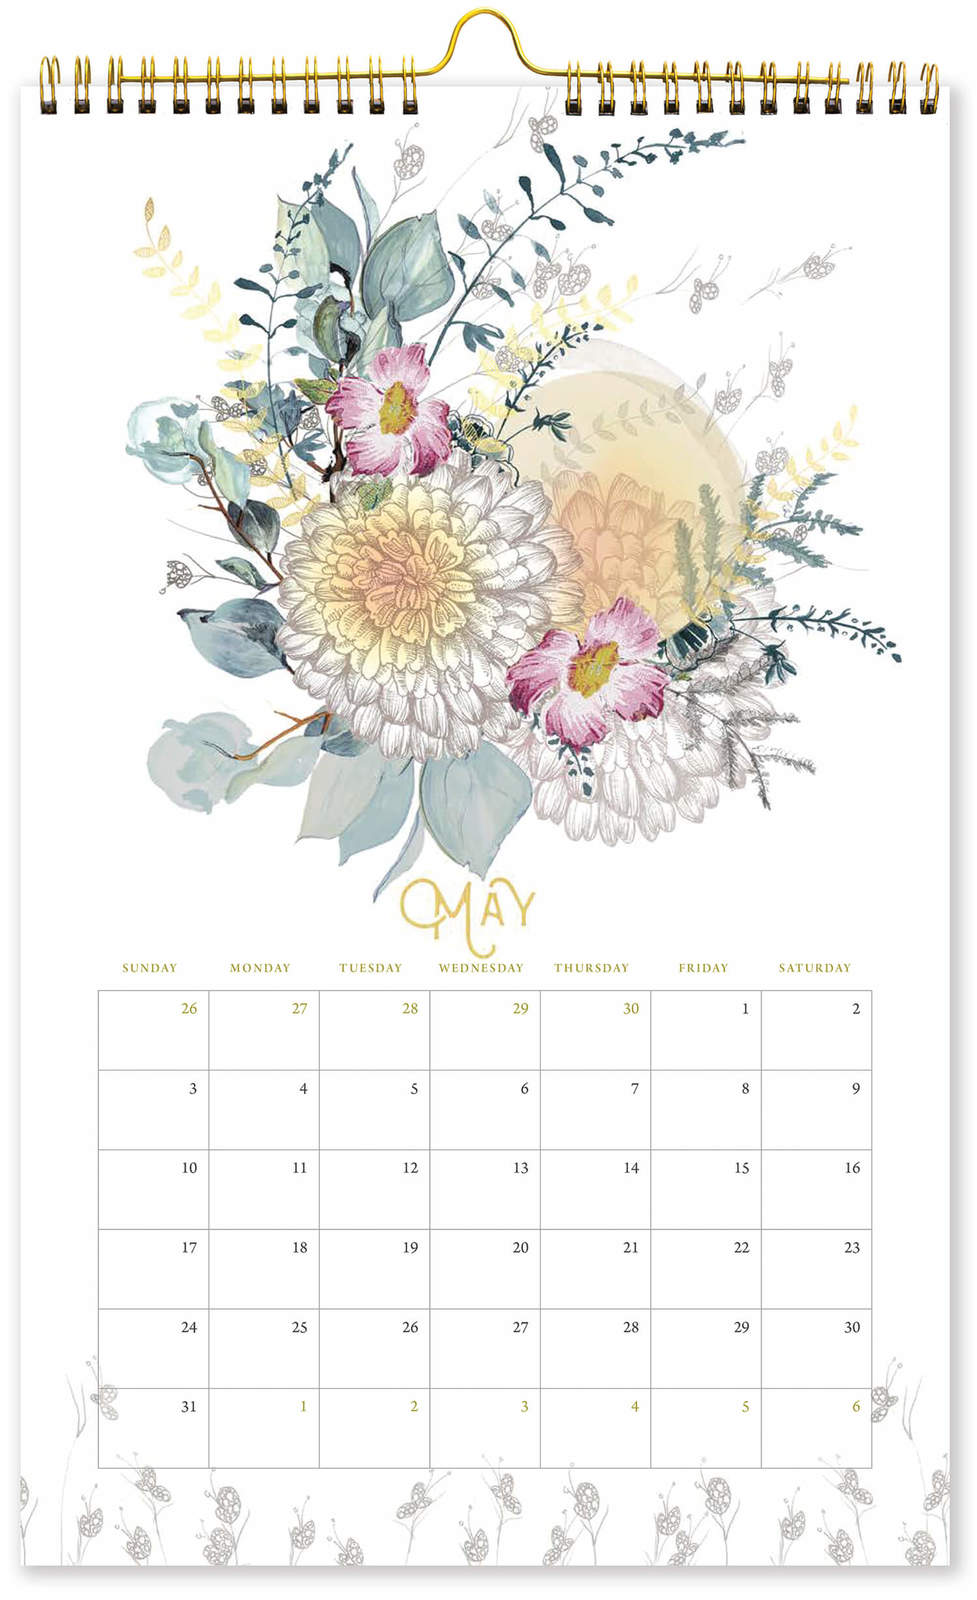 Papaya: 2020 Wall Calendar - Rare Species image